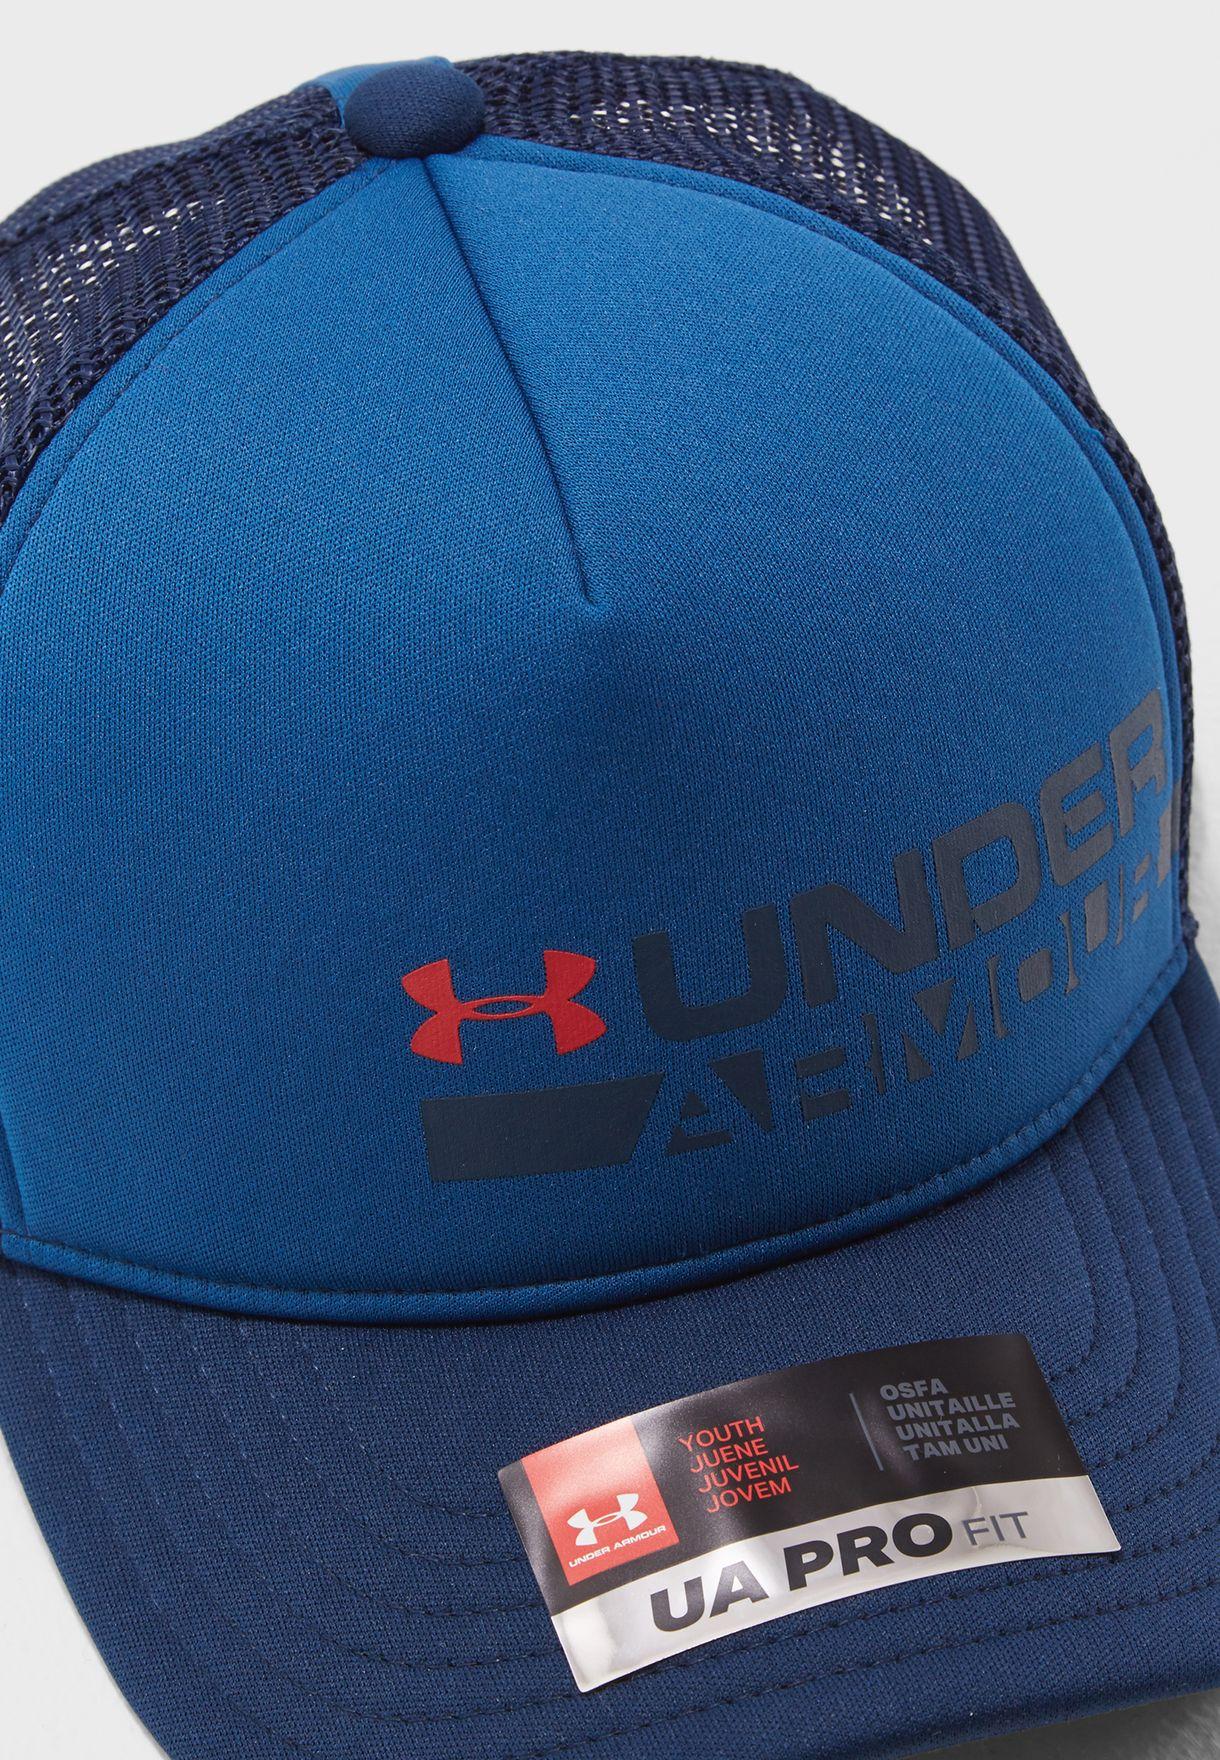 Shop Under Armour blue Kids Novelty Trucker Cap 1305462-487 for ... e1e77c4cc569